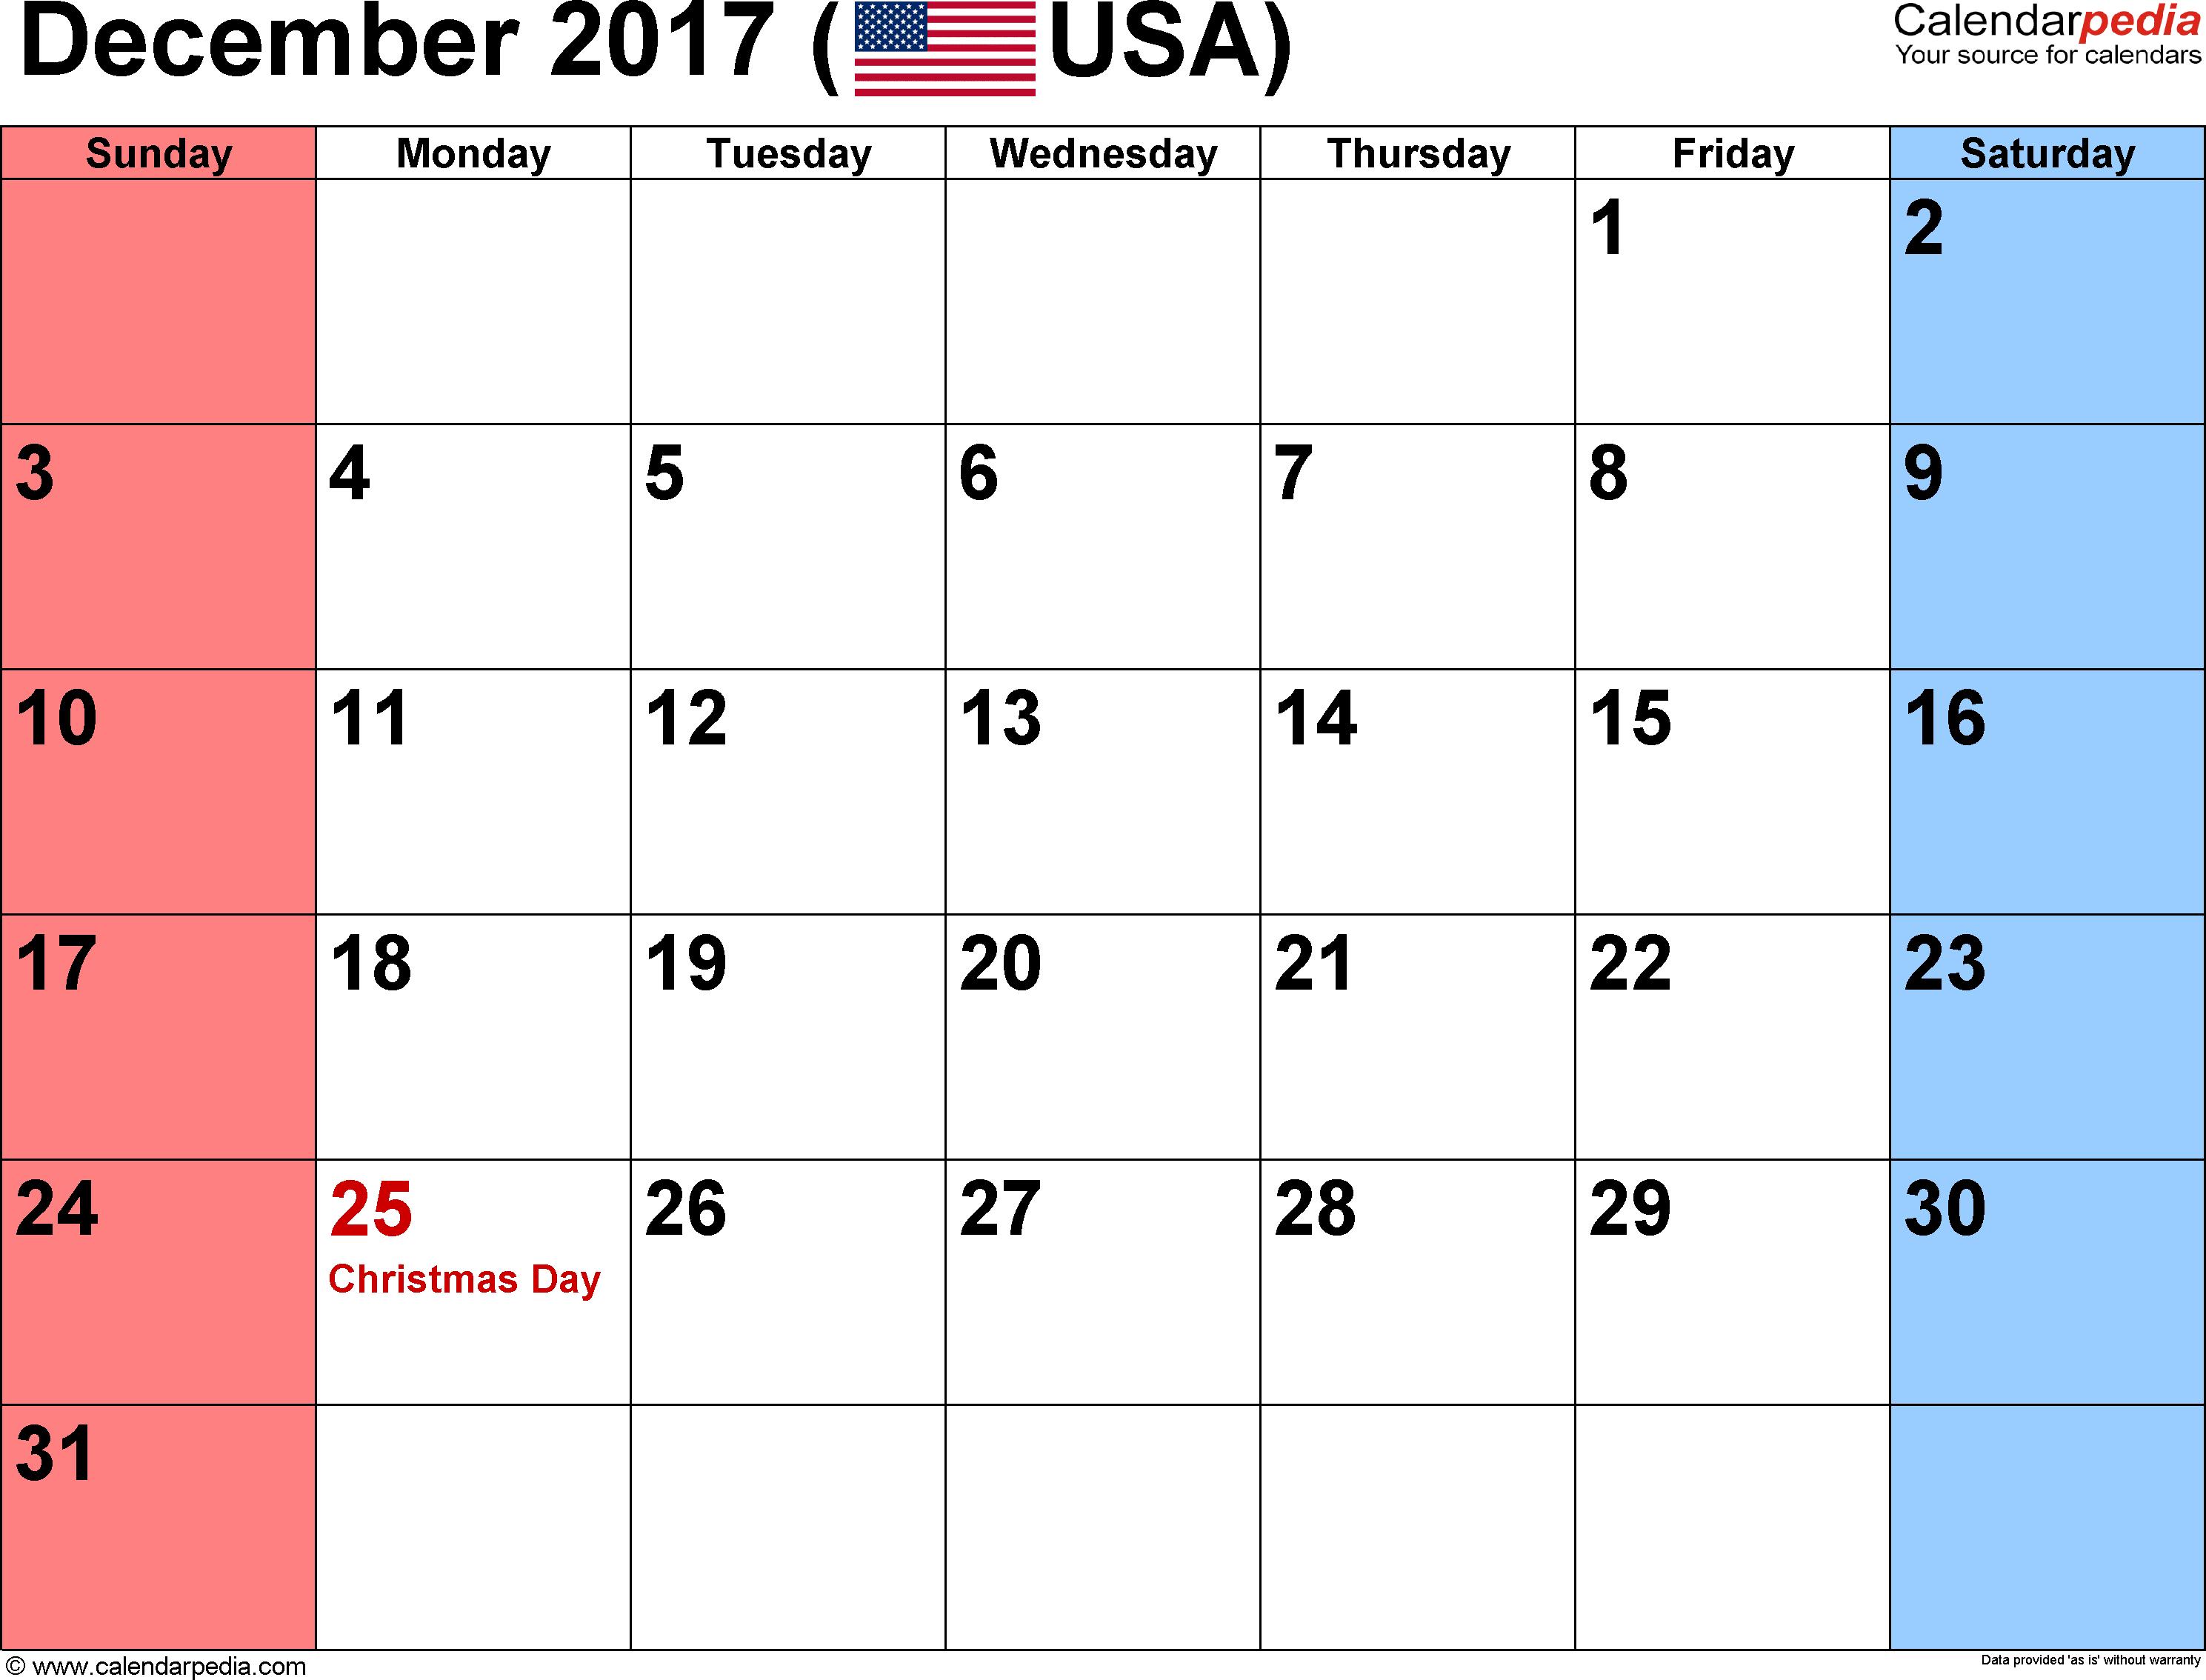 December 2017 Calendars for Word, Excel & PDF